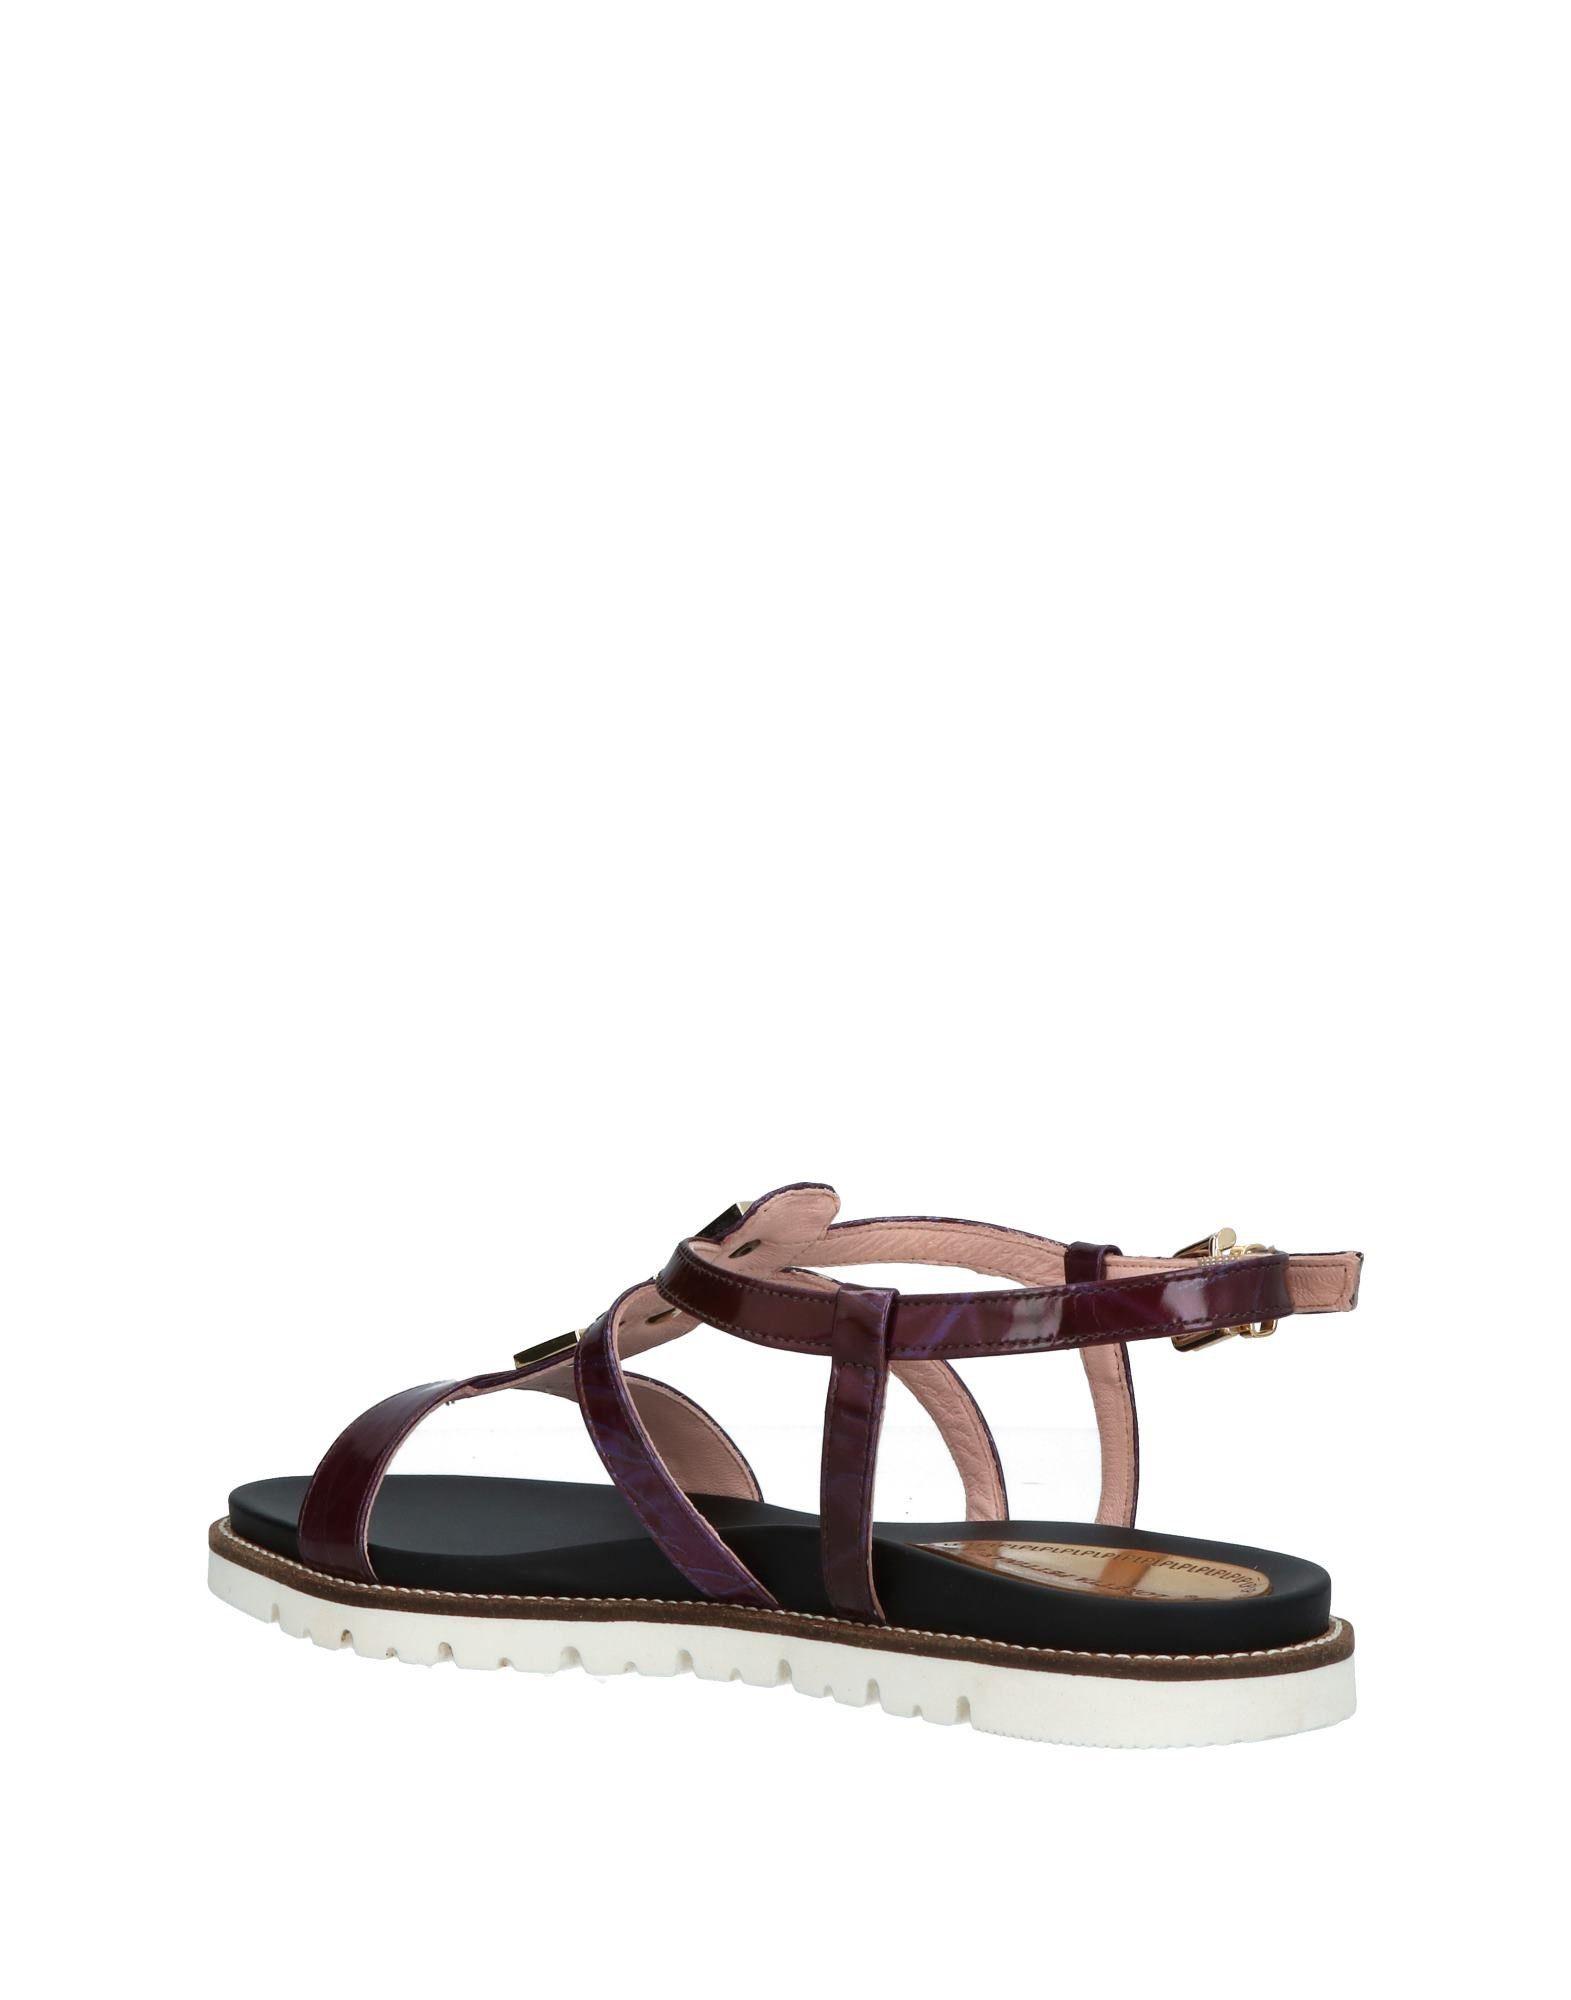 Loretta Pettinari Sandalen Damen  11389991FC Gute Qualität beliebte Schuhe